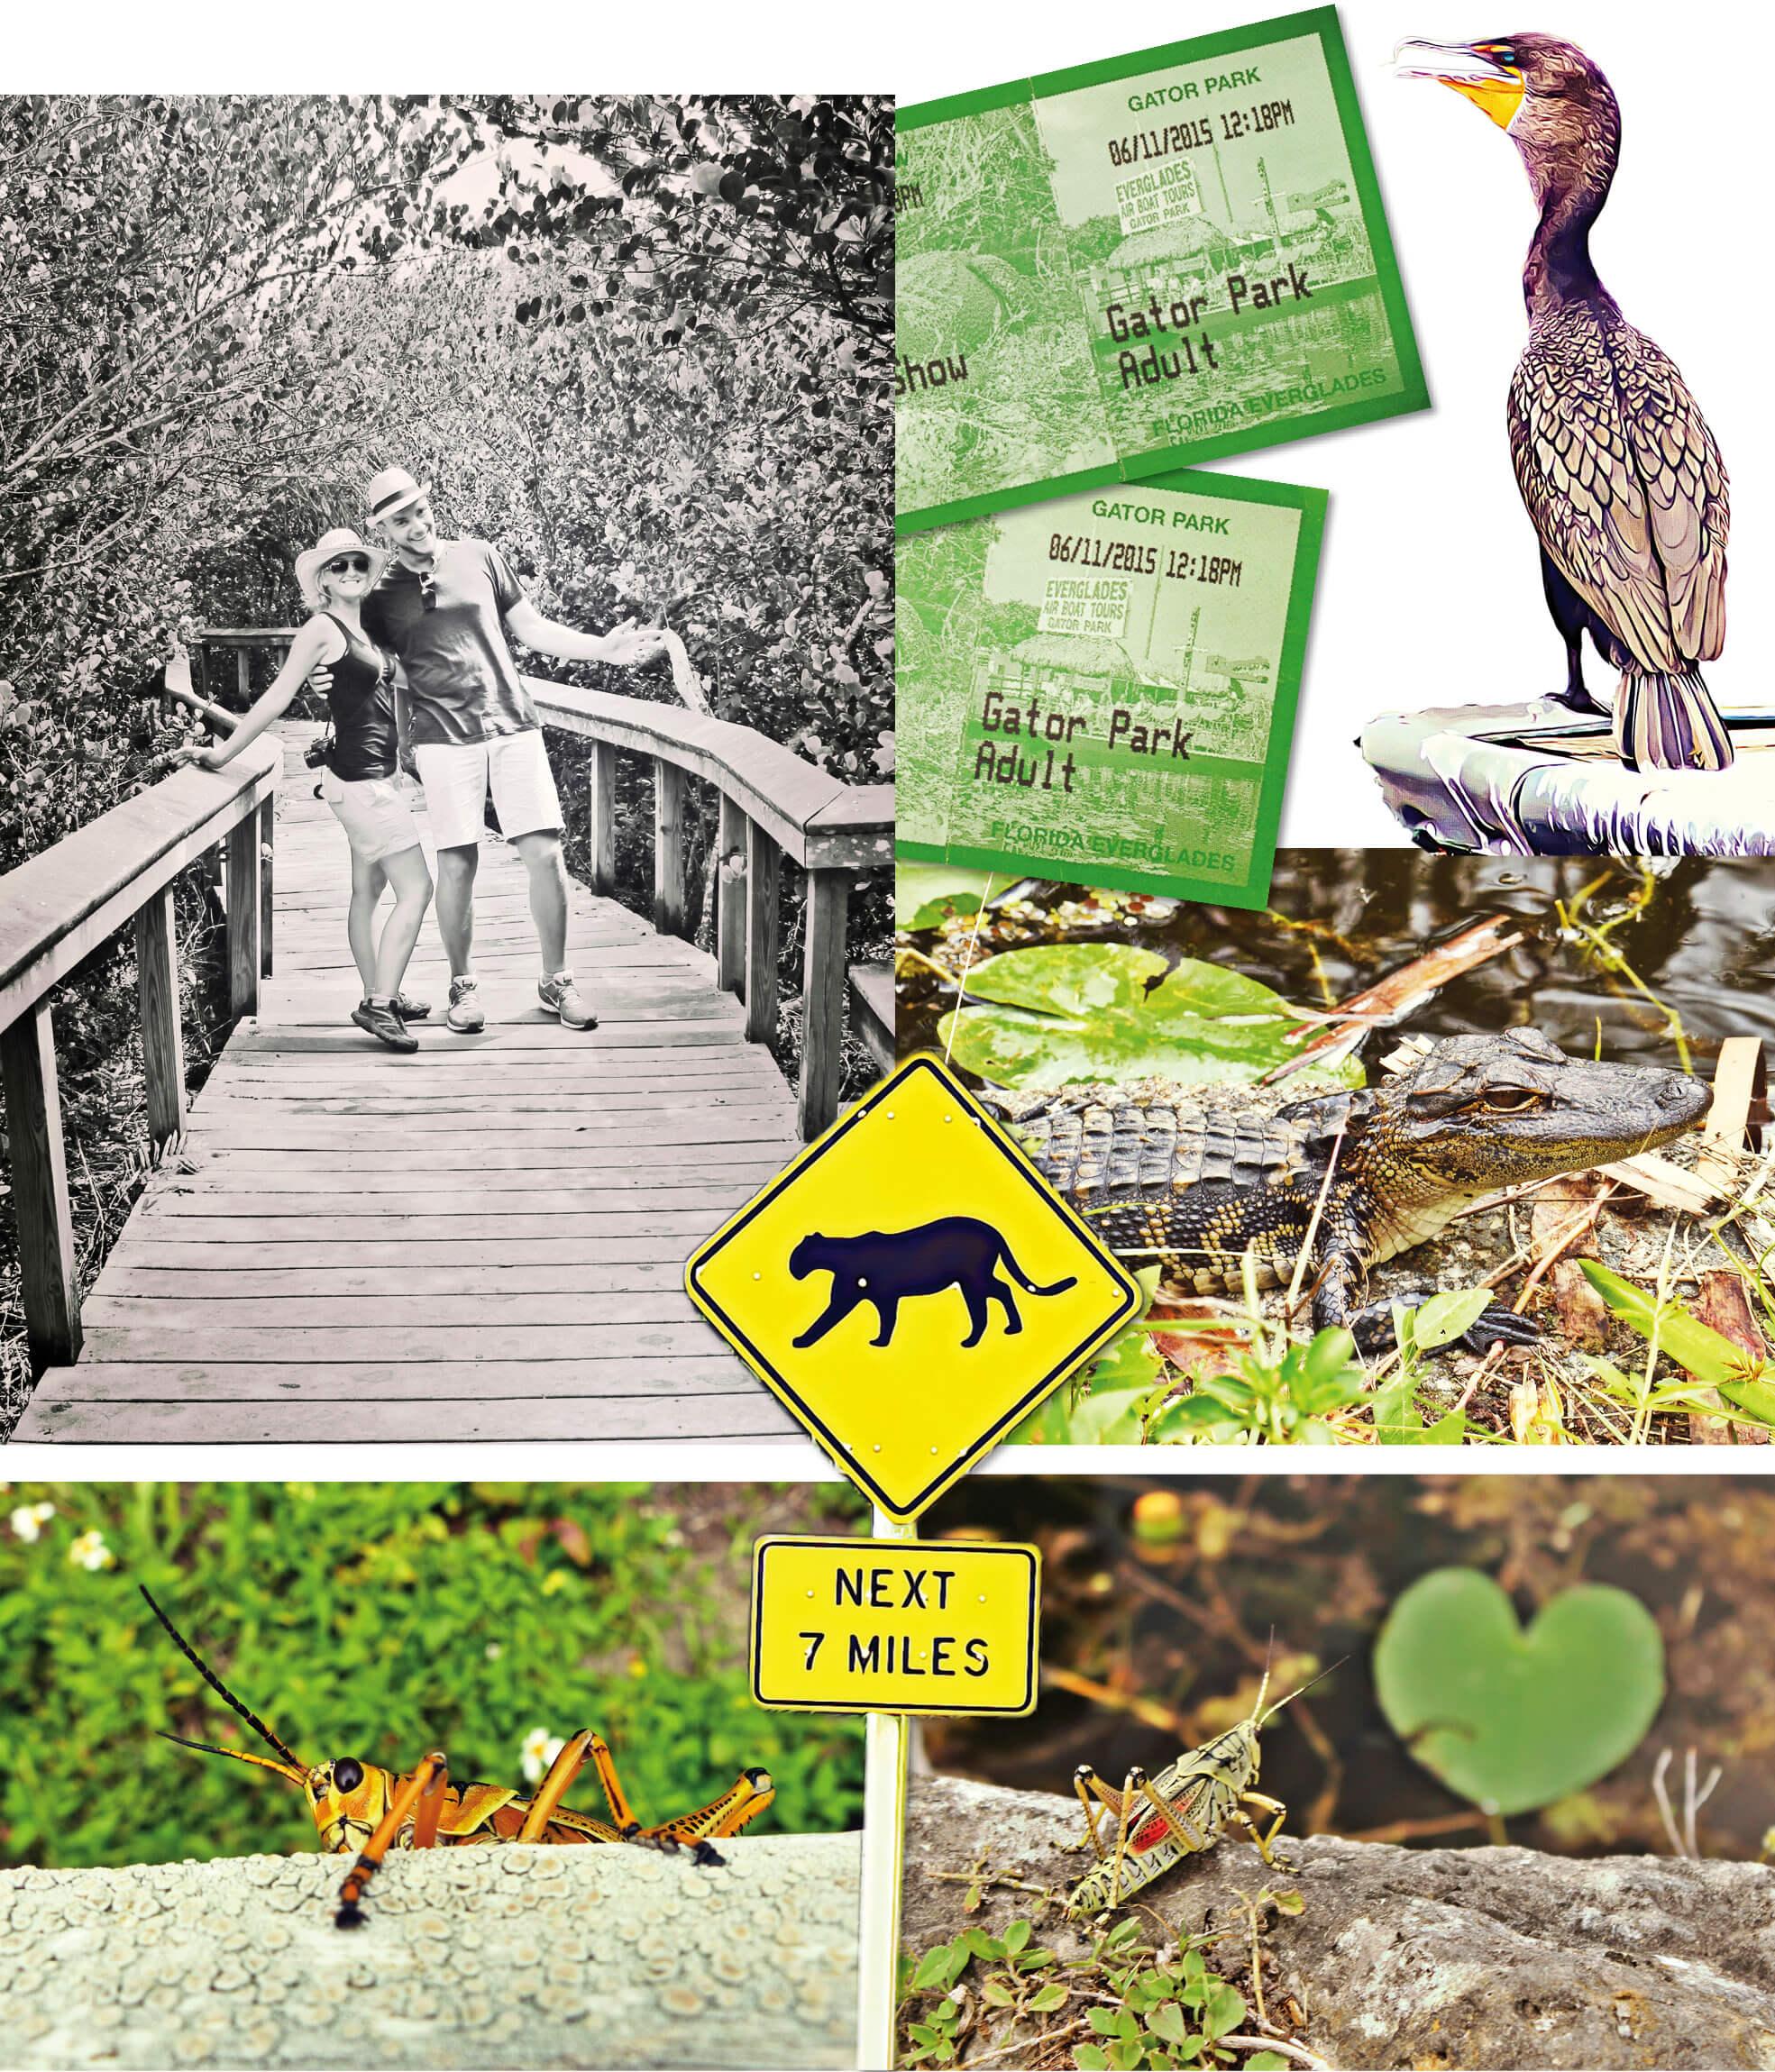 usa, voyage, Floride, Miami, everglades, crocodiles, crickets, serpents, sunshine state, road trip,